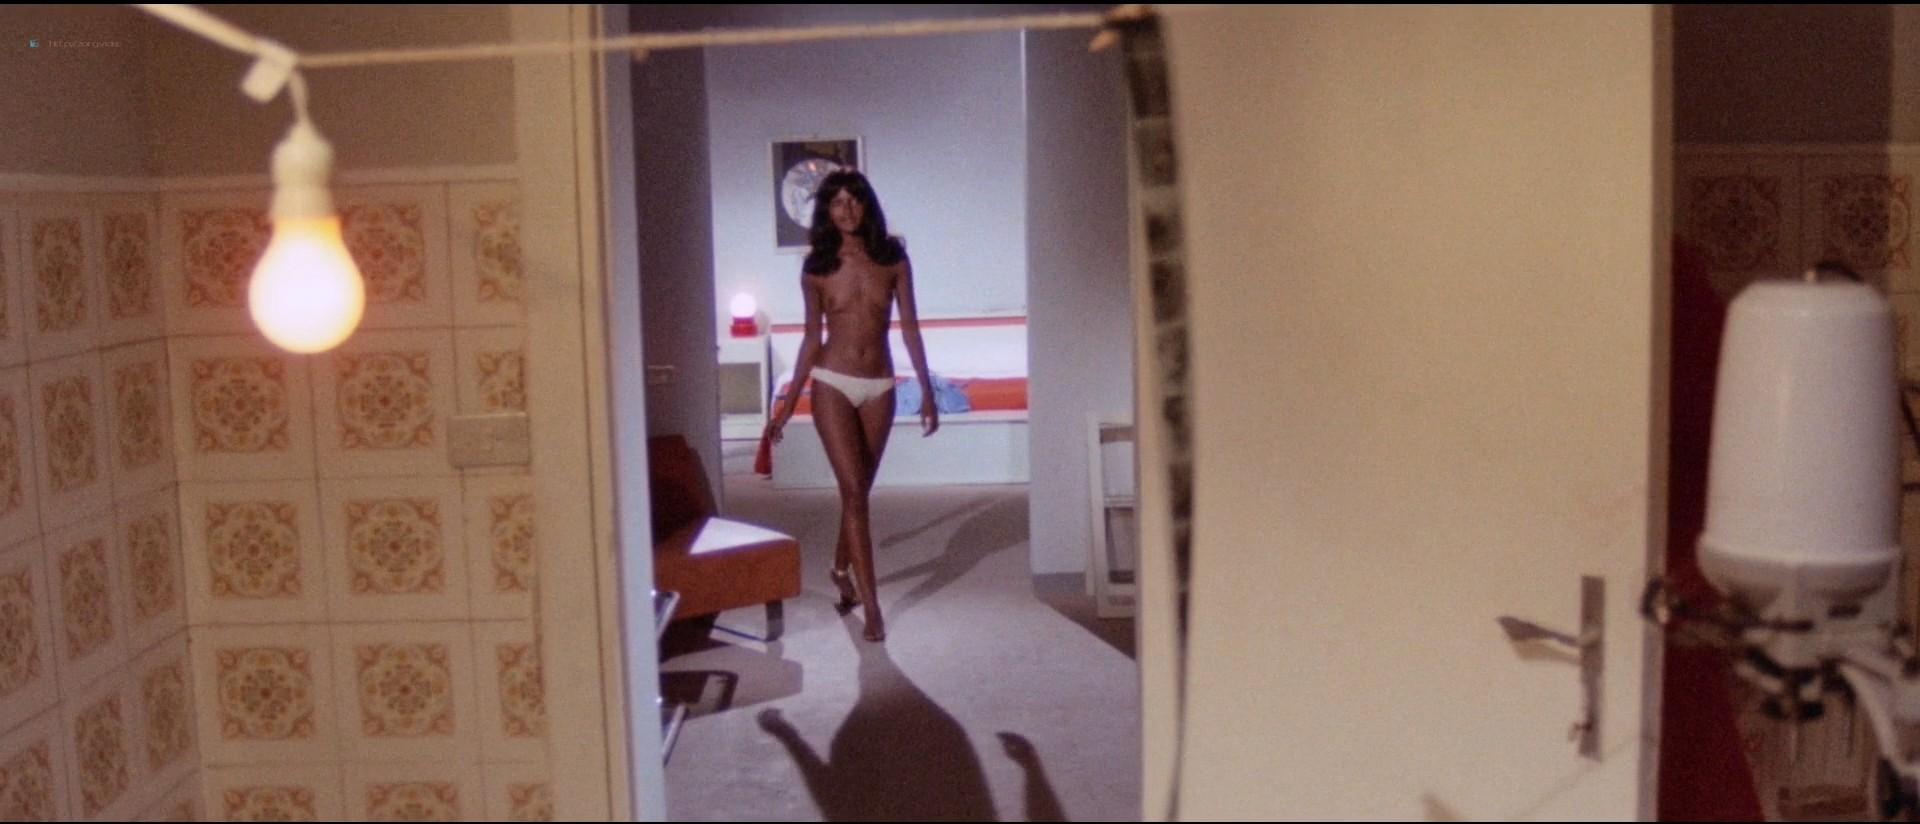 Martine Brochard nude Mirta Miller, Ines Pellegrini nude too - Eyeball (IT-1975) 1080p BluRay (7)